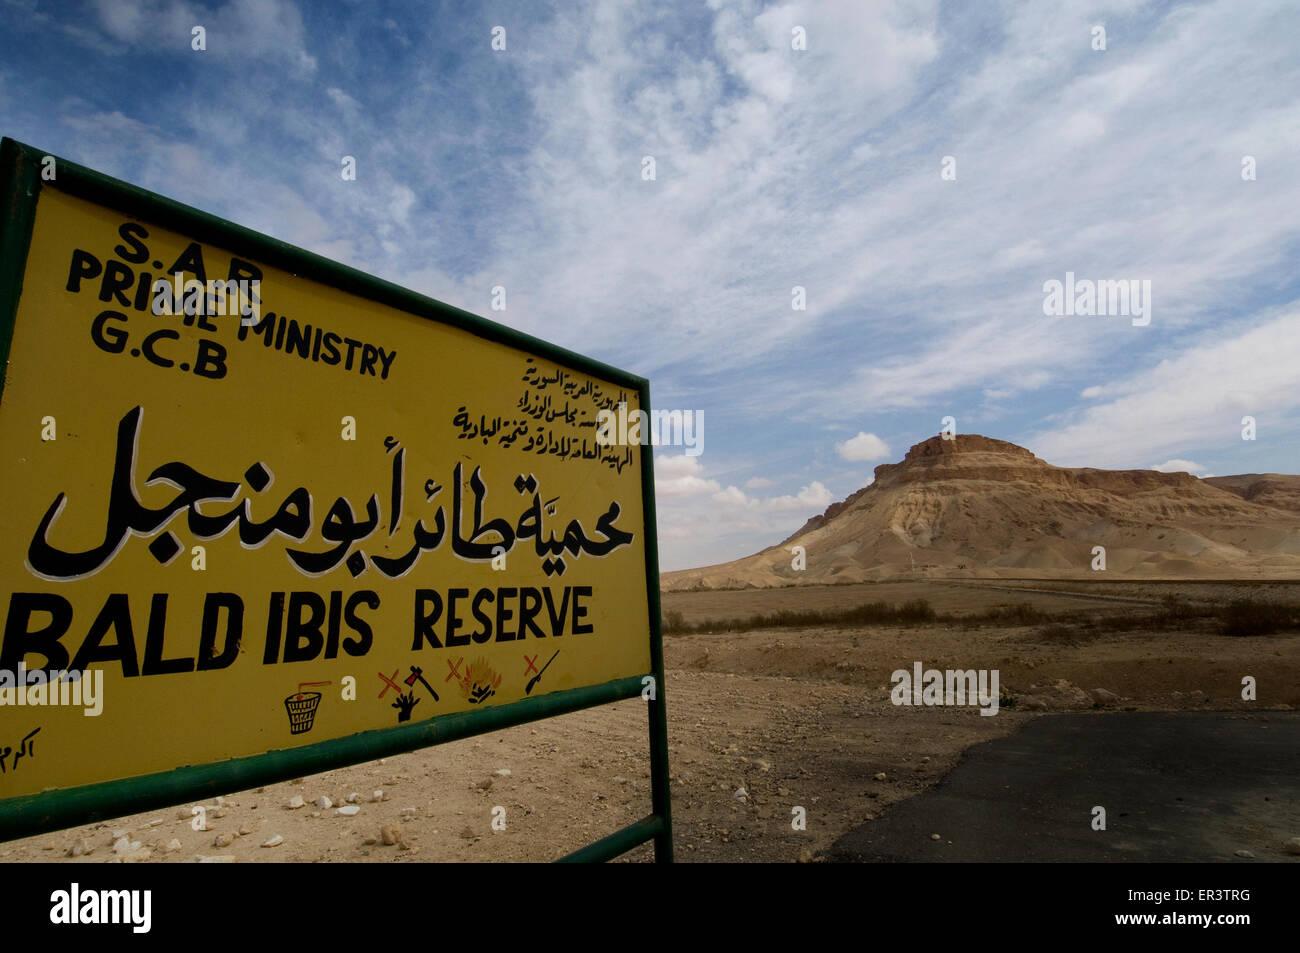 Bald Ibis Nature Reserve in Palmyra Syria - Stock Image